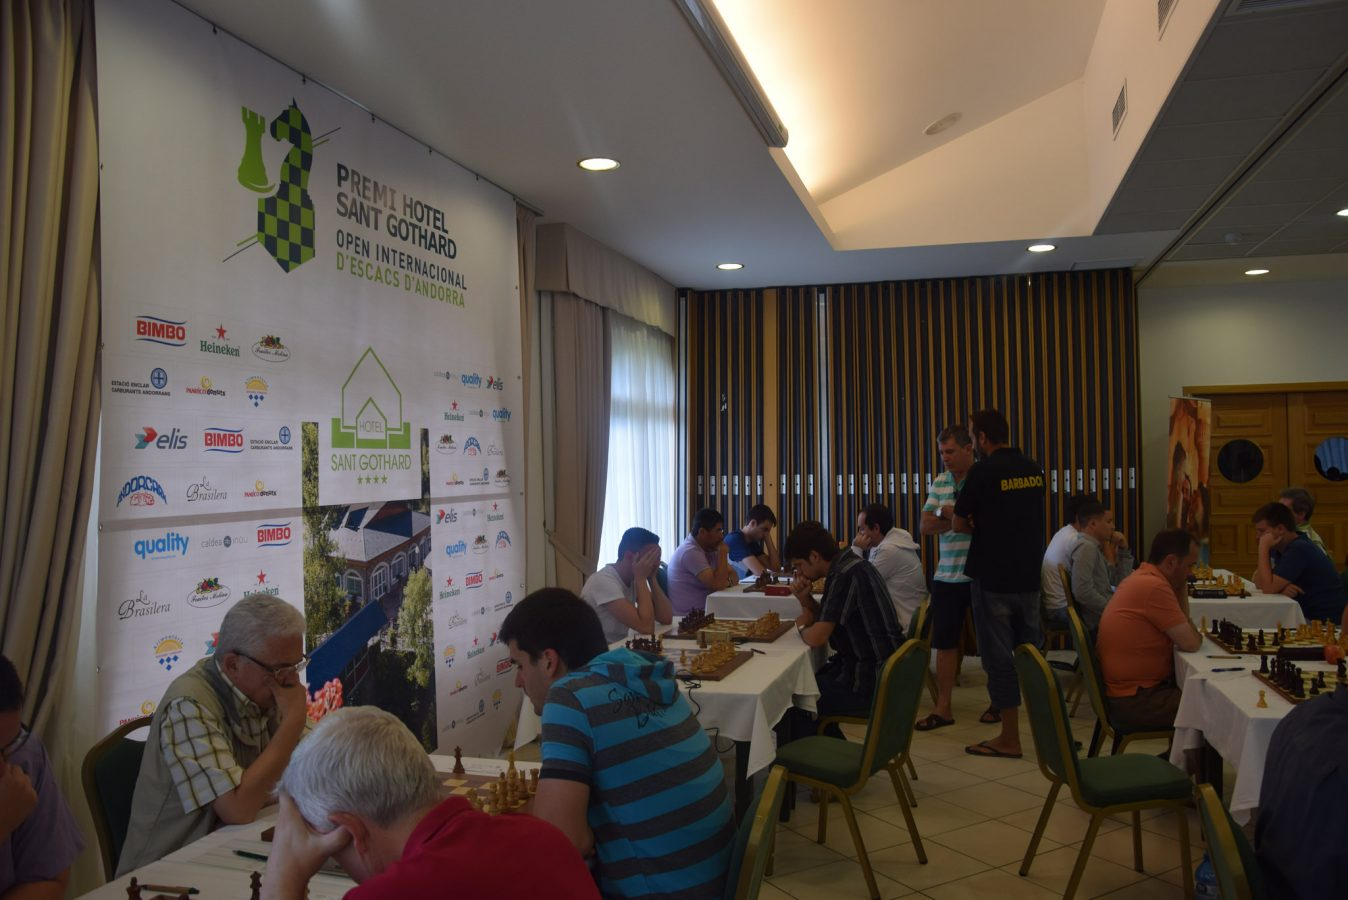 33 Open Andorra Hotel St. Gothard – R2